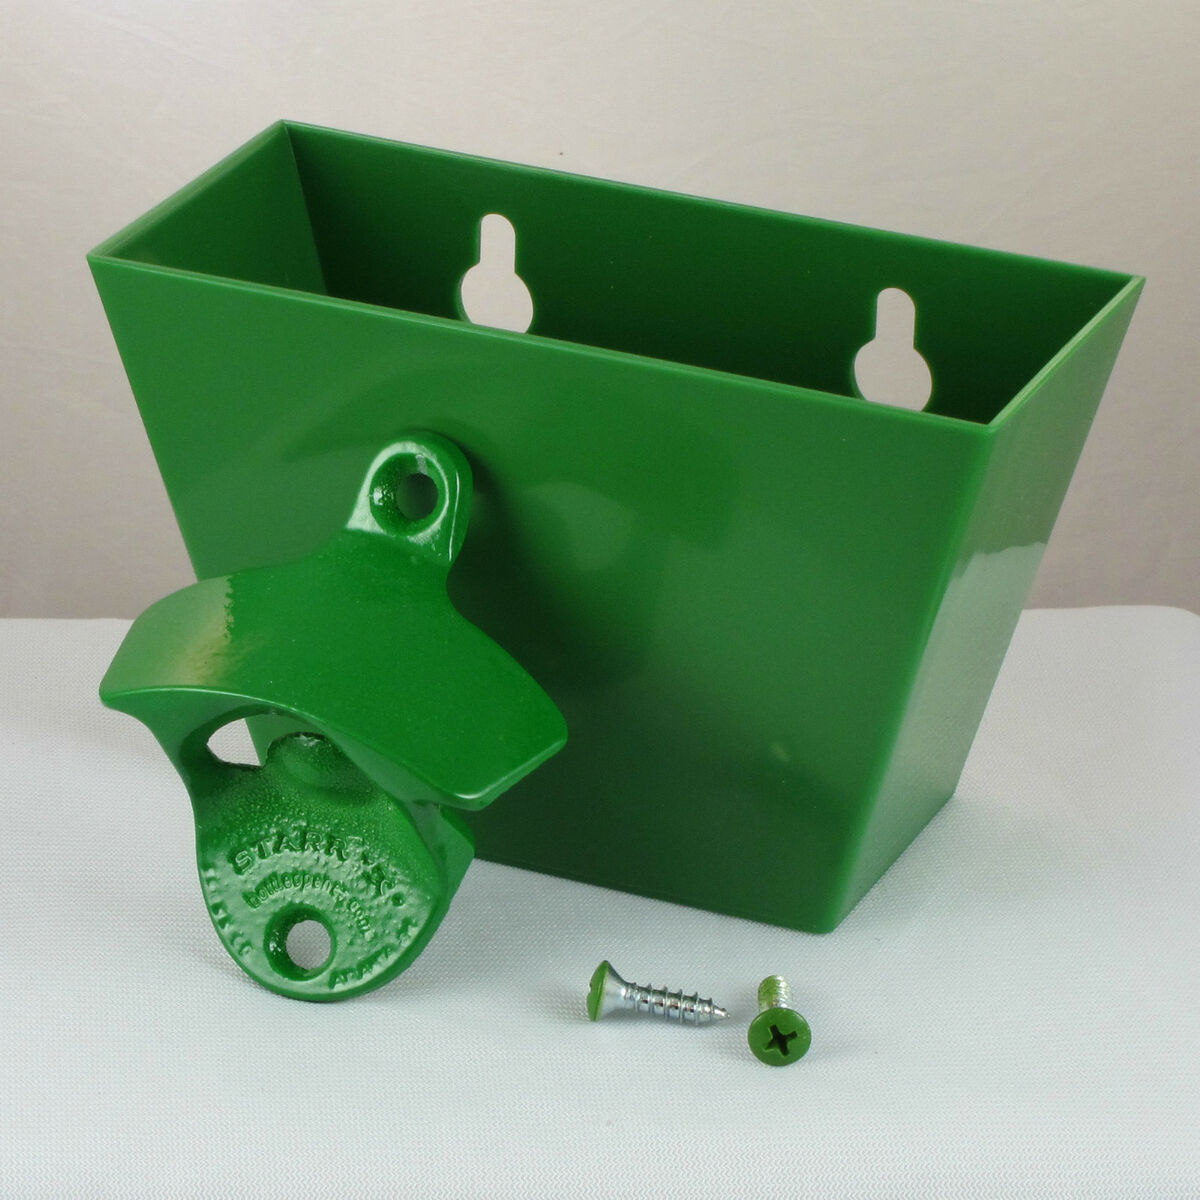 Light Green Plain Combo Starr Wall Mount Bottle Opener and Green Cap Catcher Set